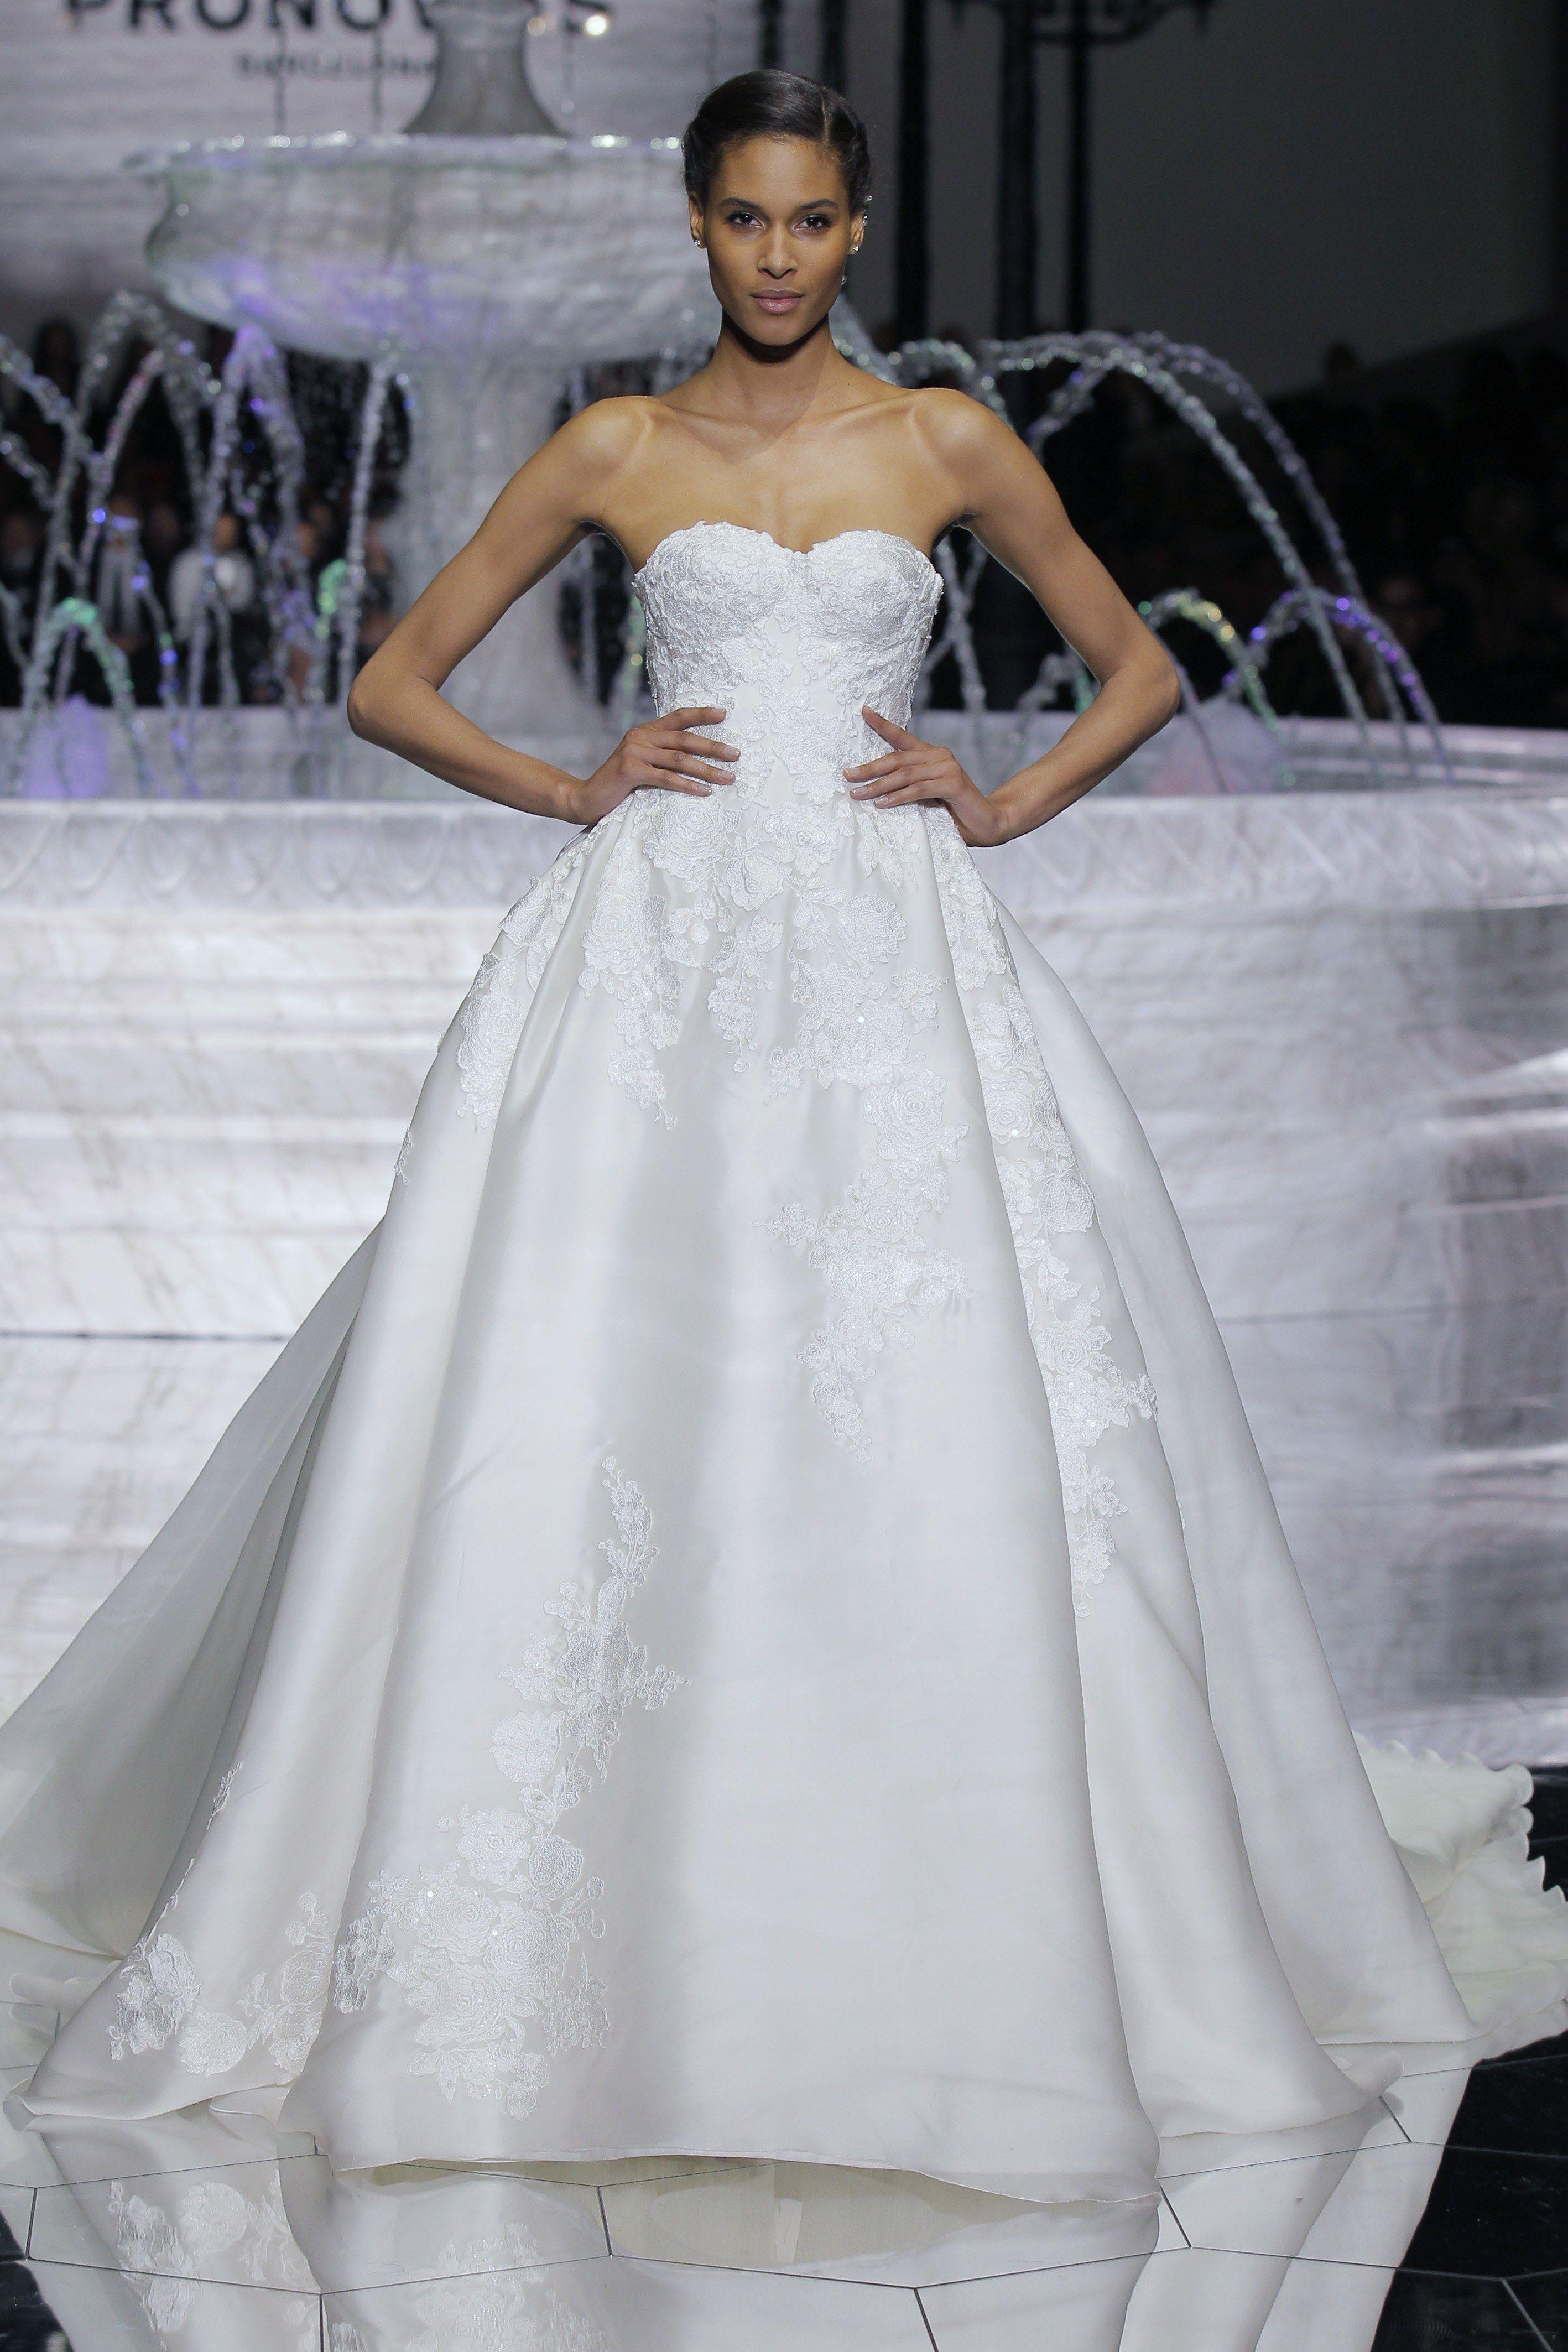 Pronovias wedding dresses bridal spring 2018 brides 2018 pronovias wedding dresses bridal spring 2018 brides ombrellifo Gallery